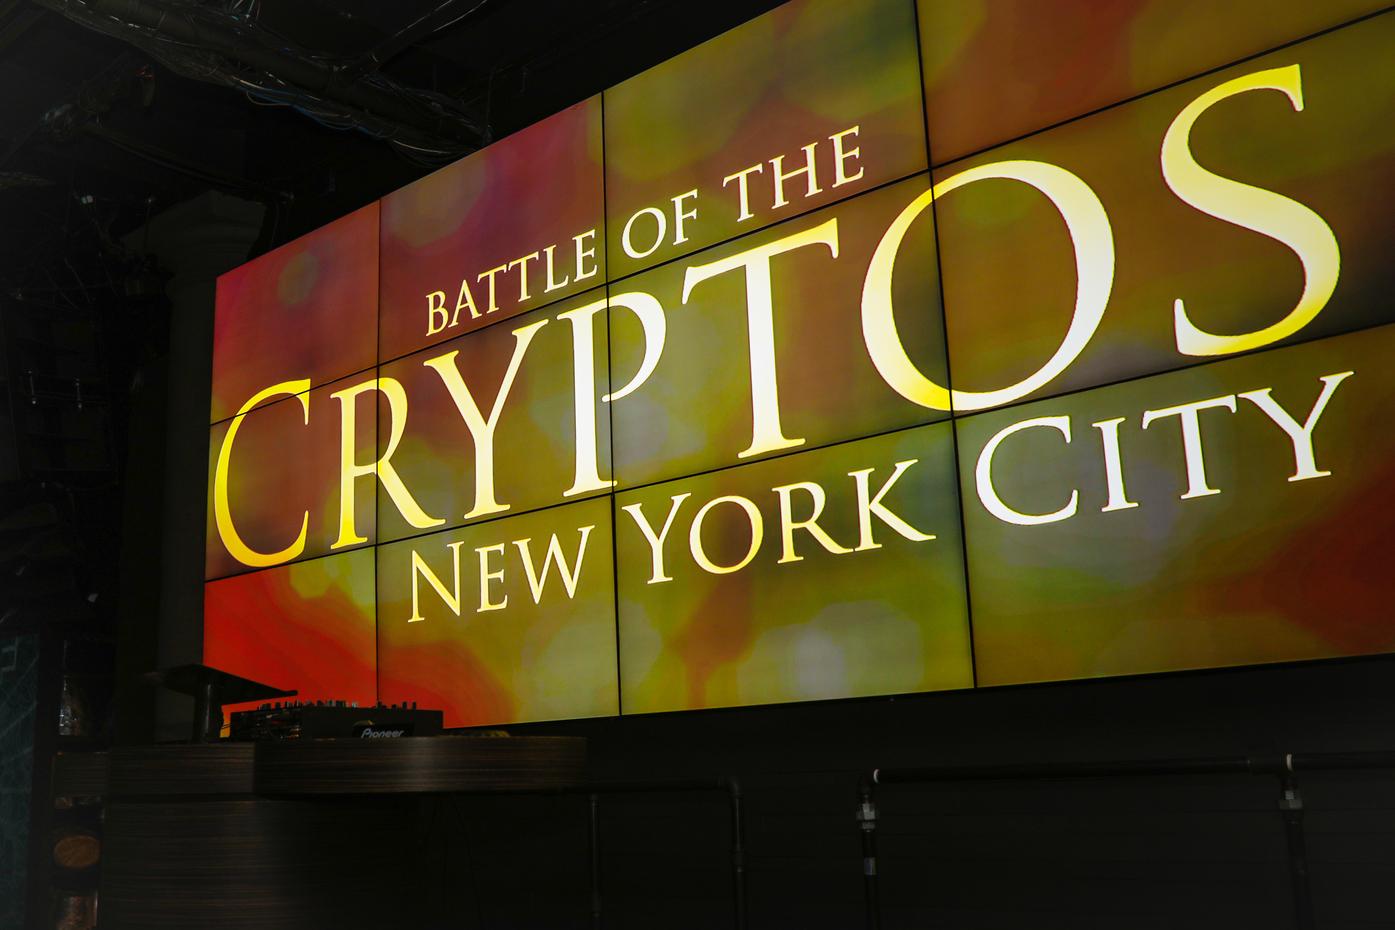 Battle of the Cryptos – Reception | New York